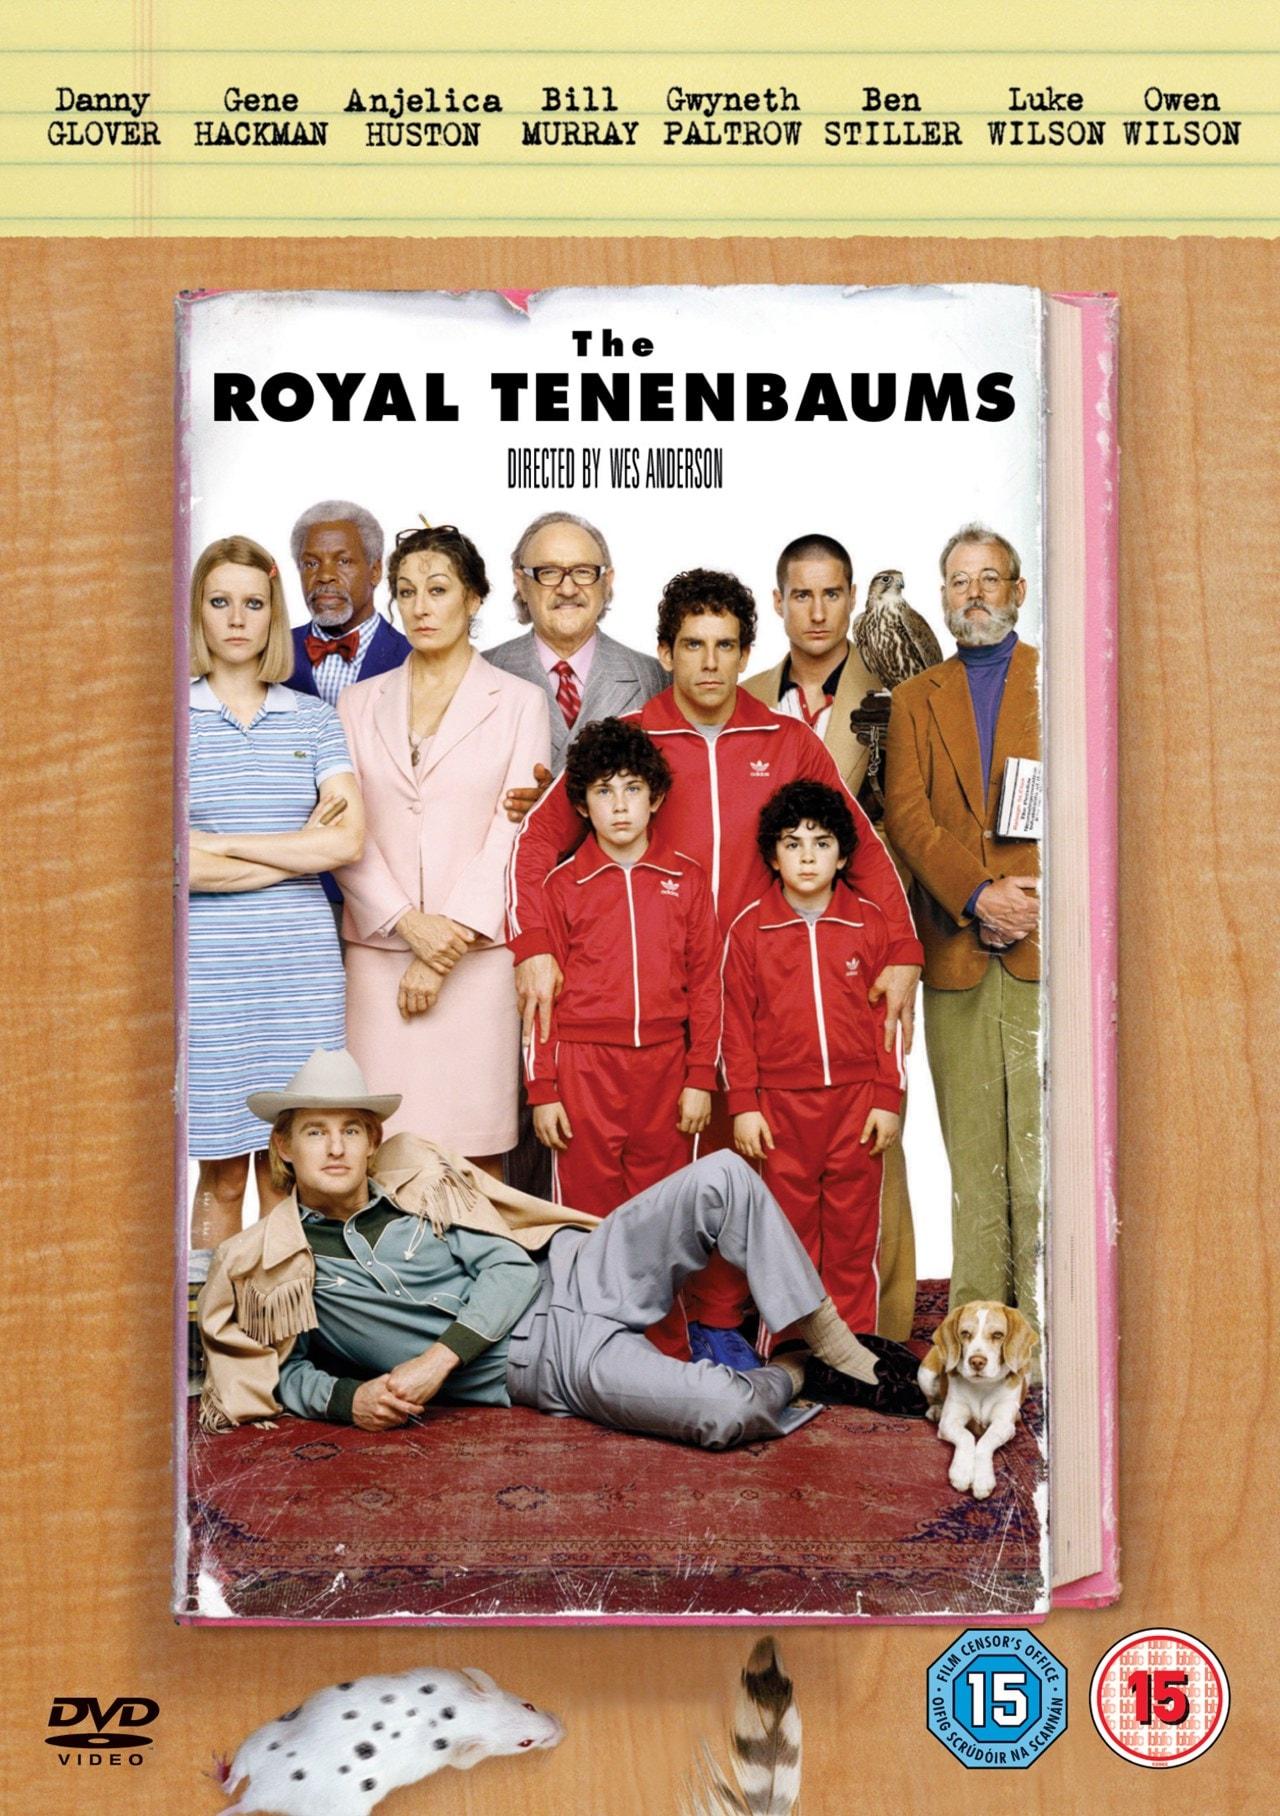 The Royal Tenenbaums - 1